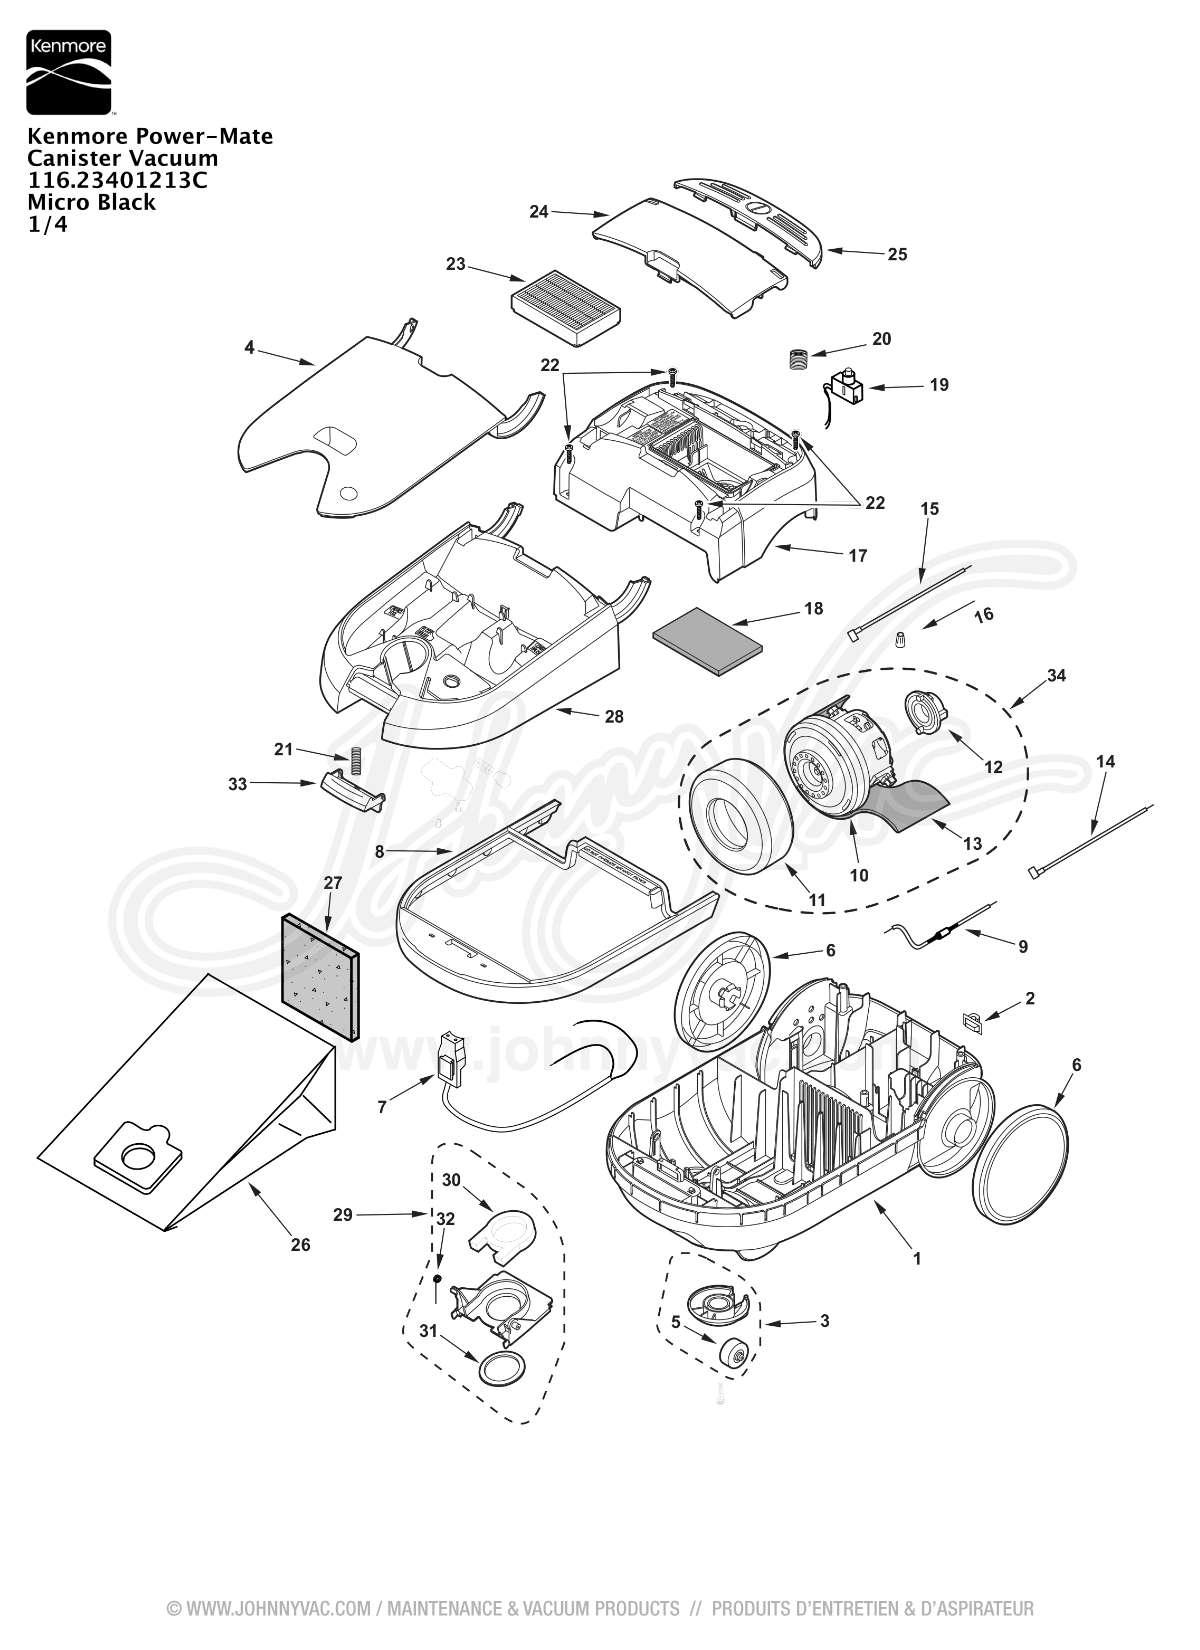 Kenmore Canister Vacuum Wiring Diagram. . Wiring Diagram on